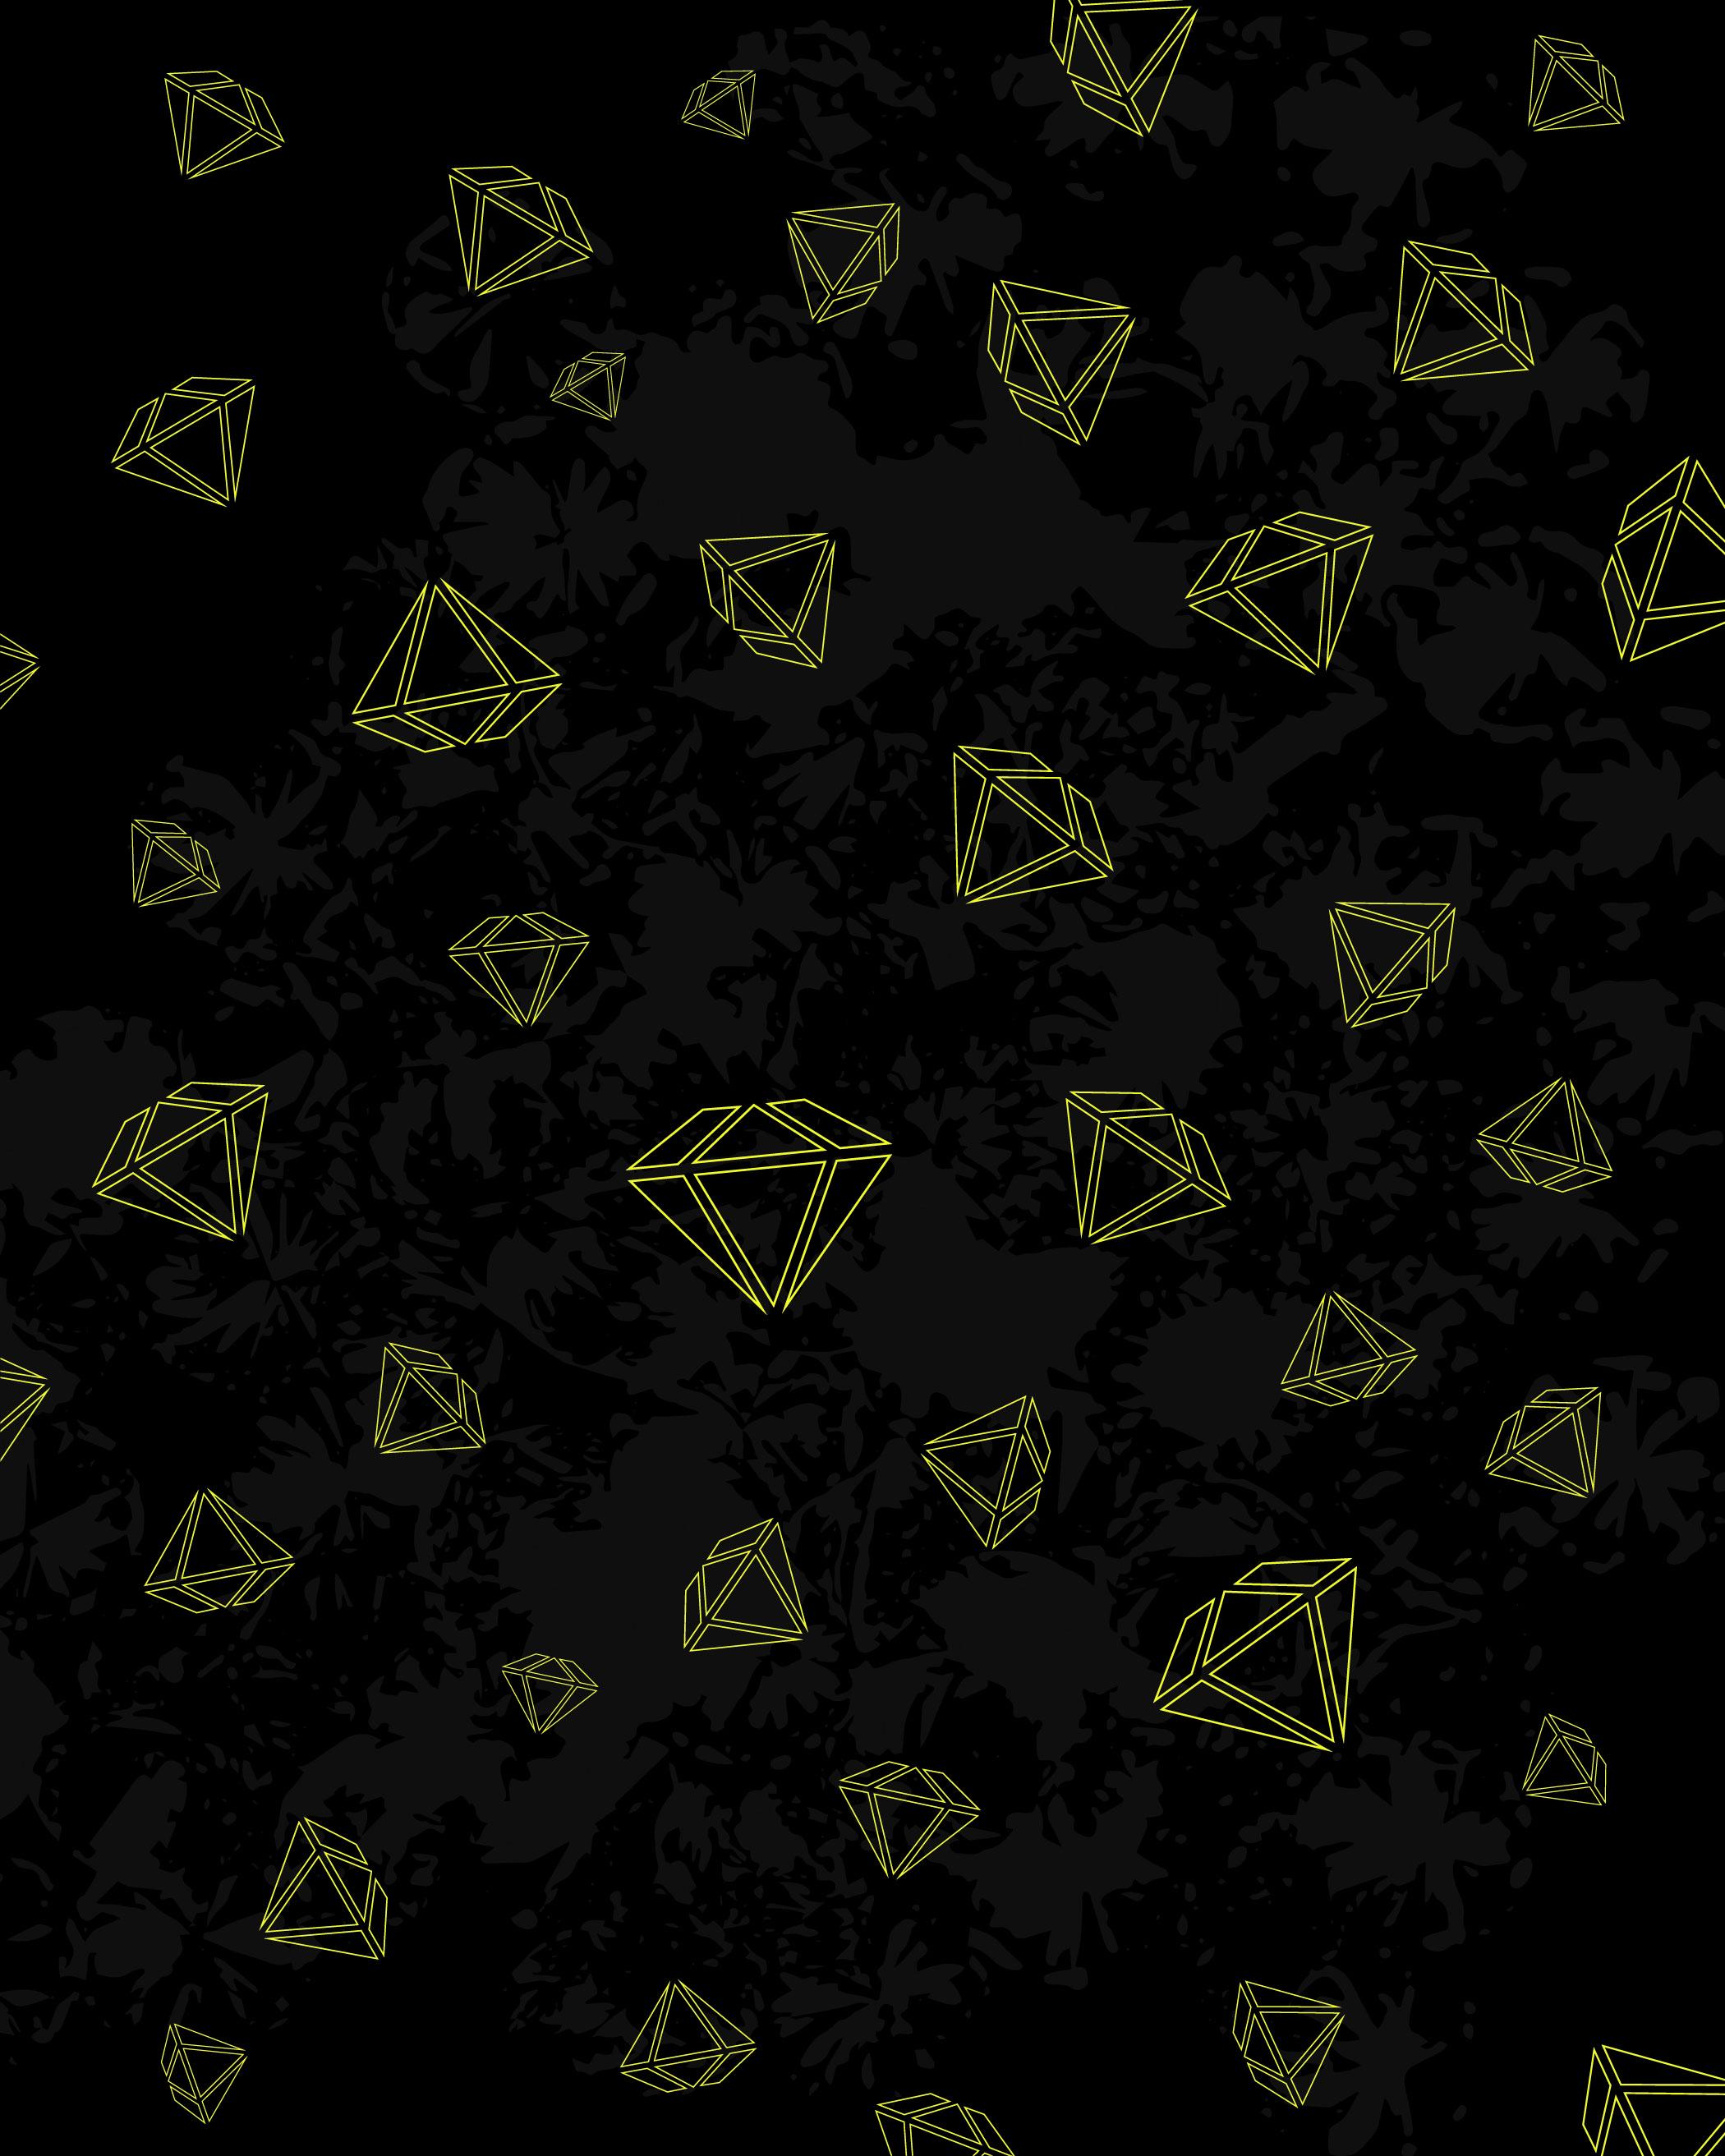 Raining Diamonds_Final_2-01.jpg